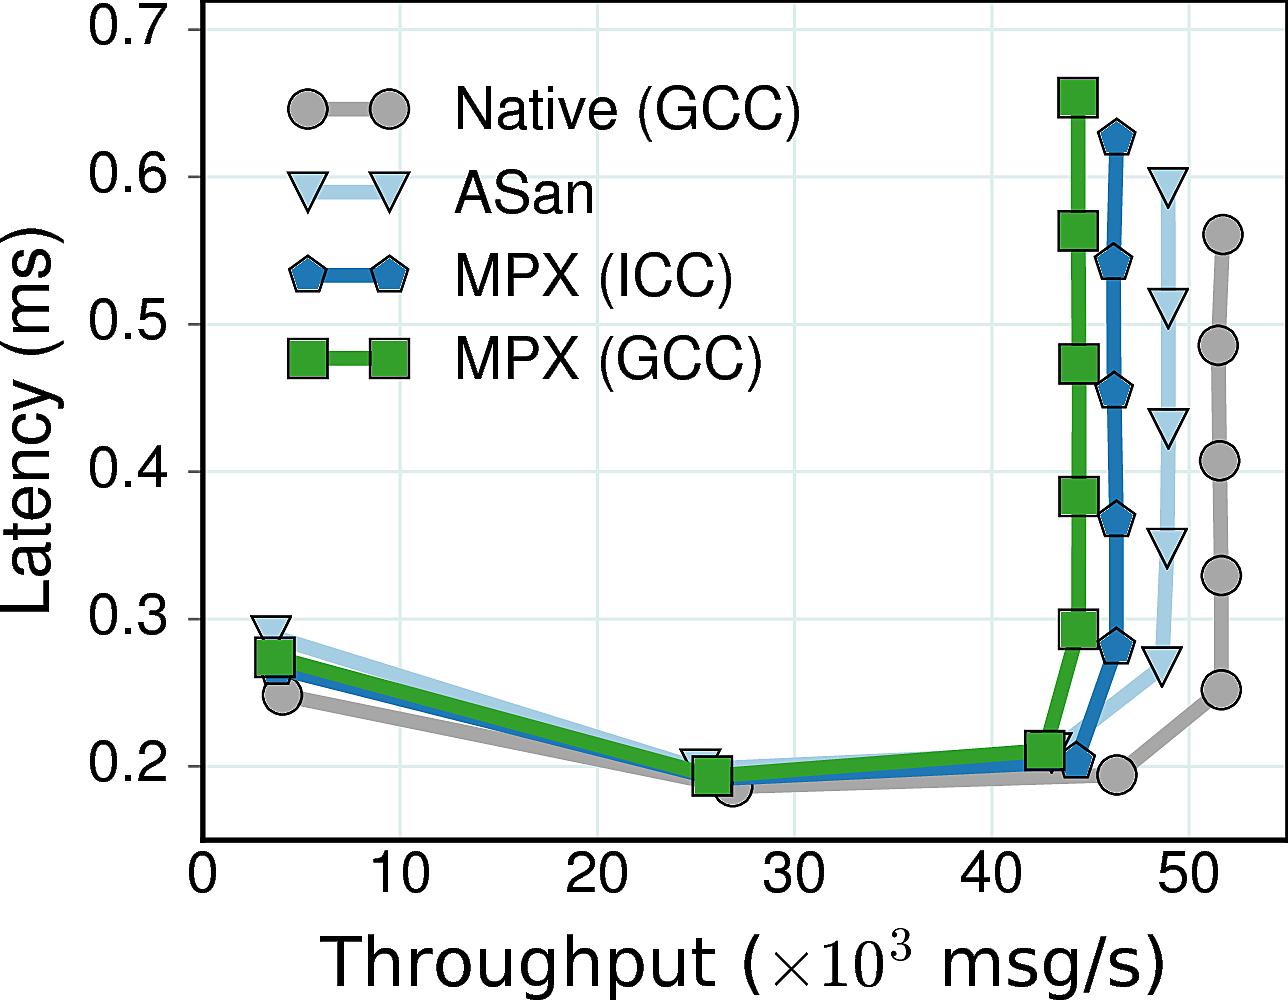 Nginx throughput-latency plot